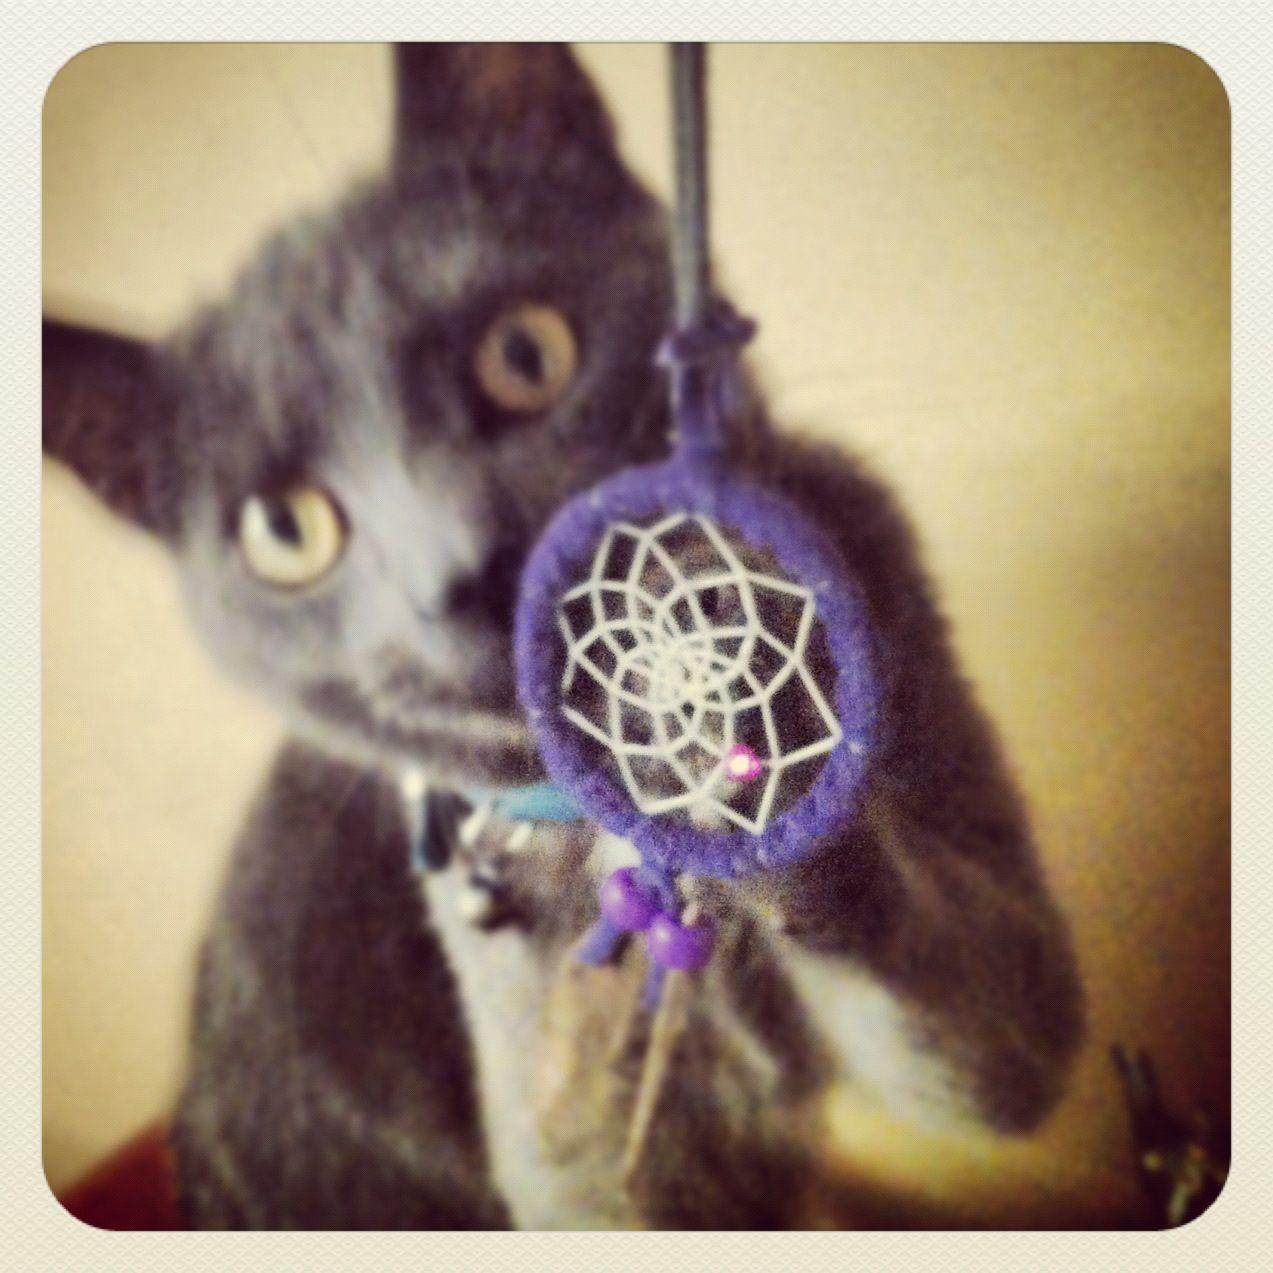 #kitty #cat #native #dreamcatcher #cute #pets